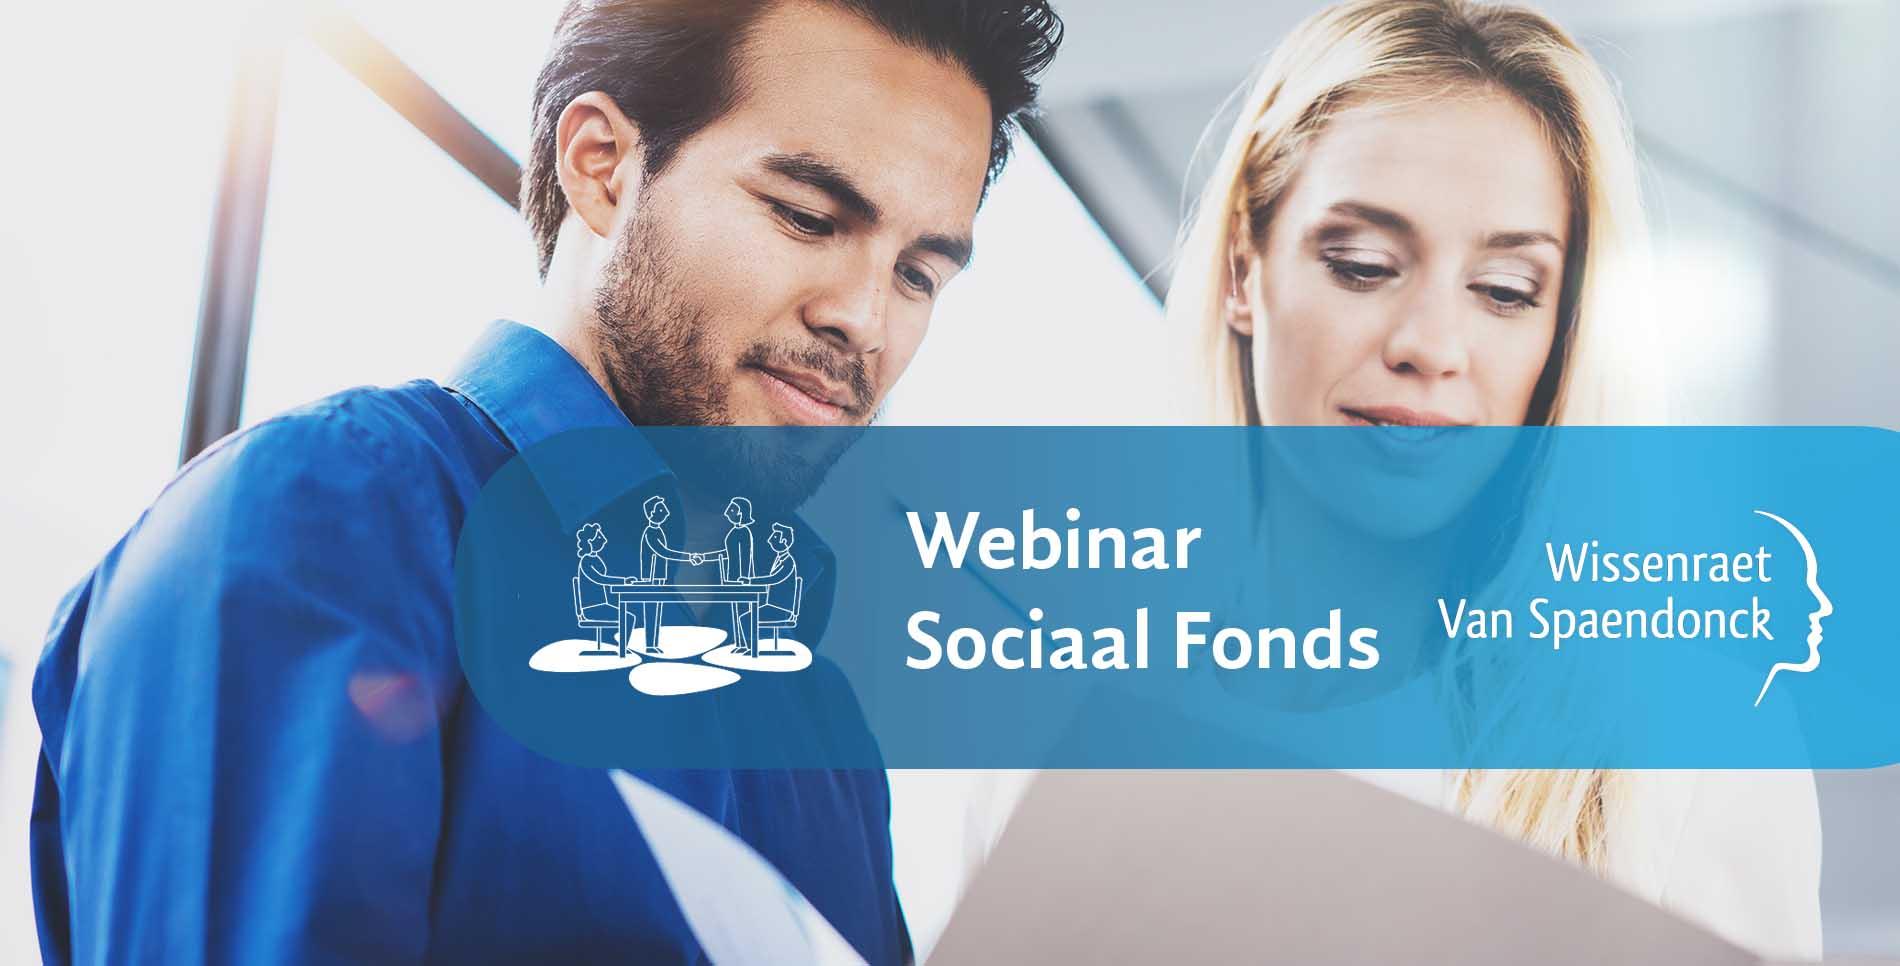 Webinar sociaal fonds